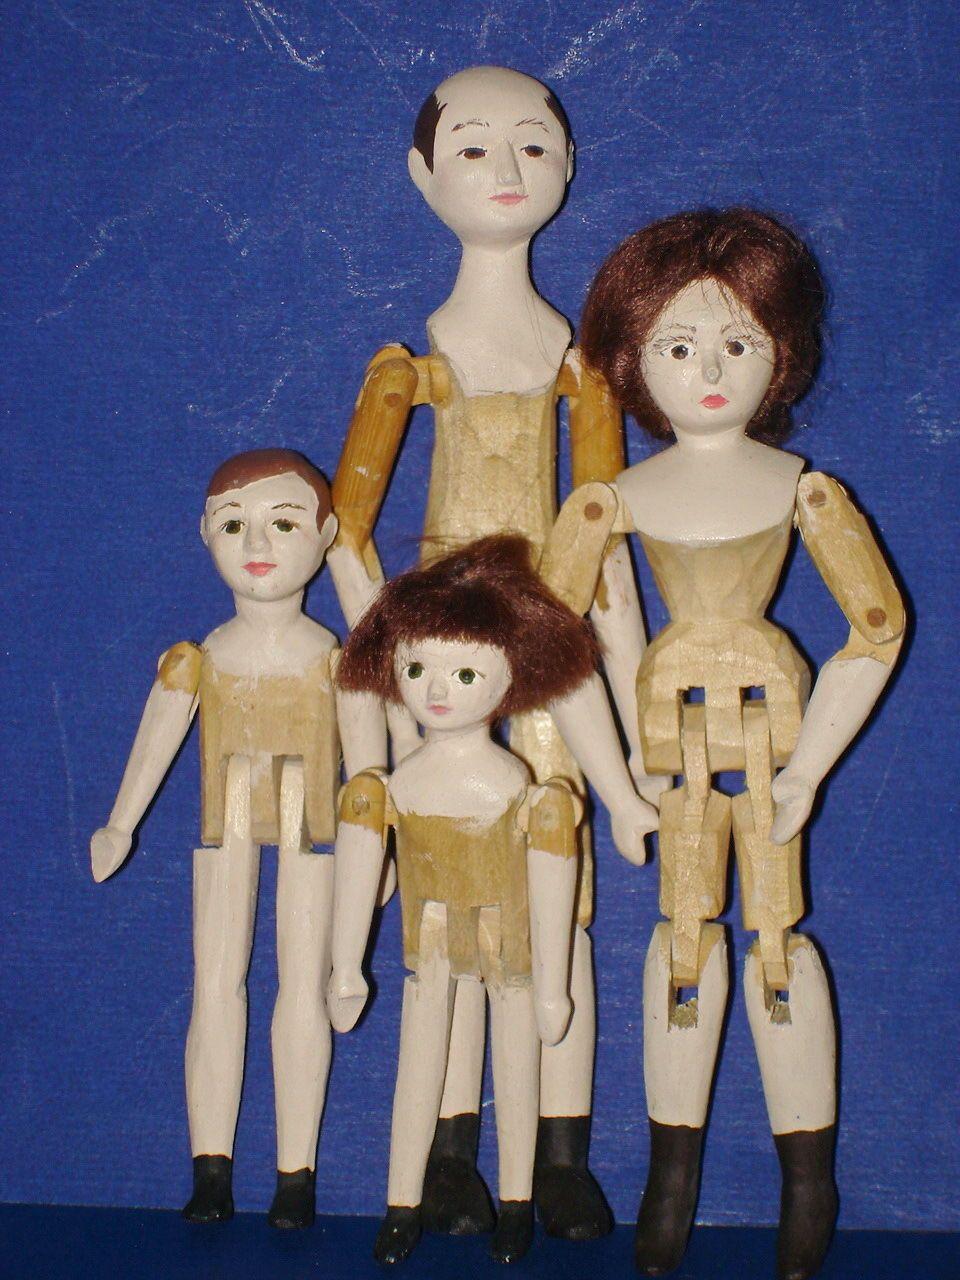 Mystery Artist Jointed Peg Wooden Dollhouse Family Dolls 1984 | eBay